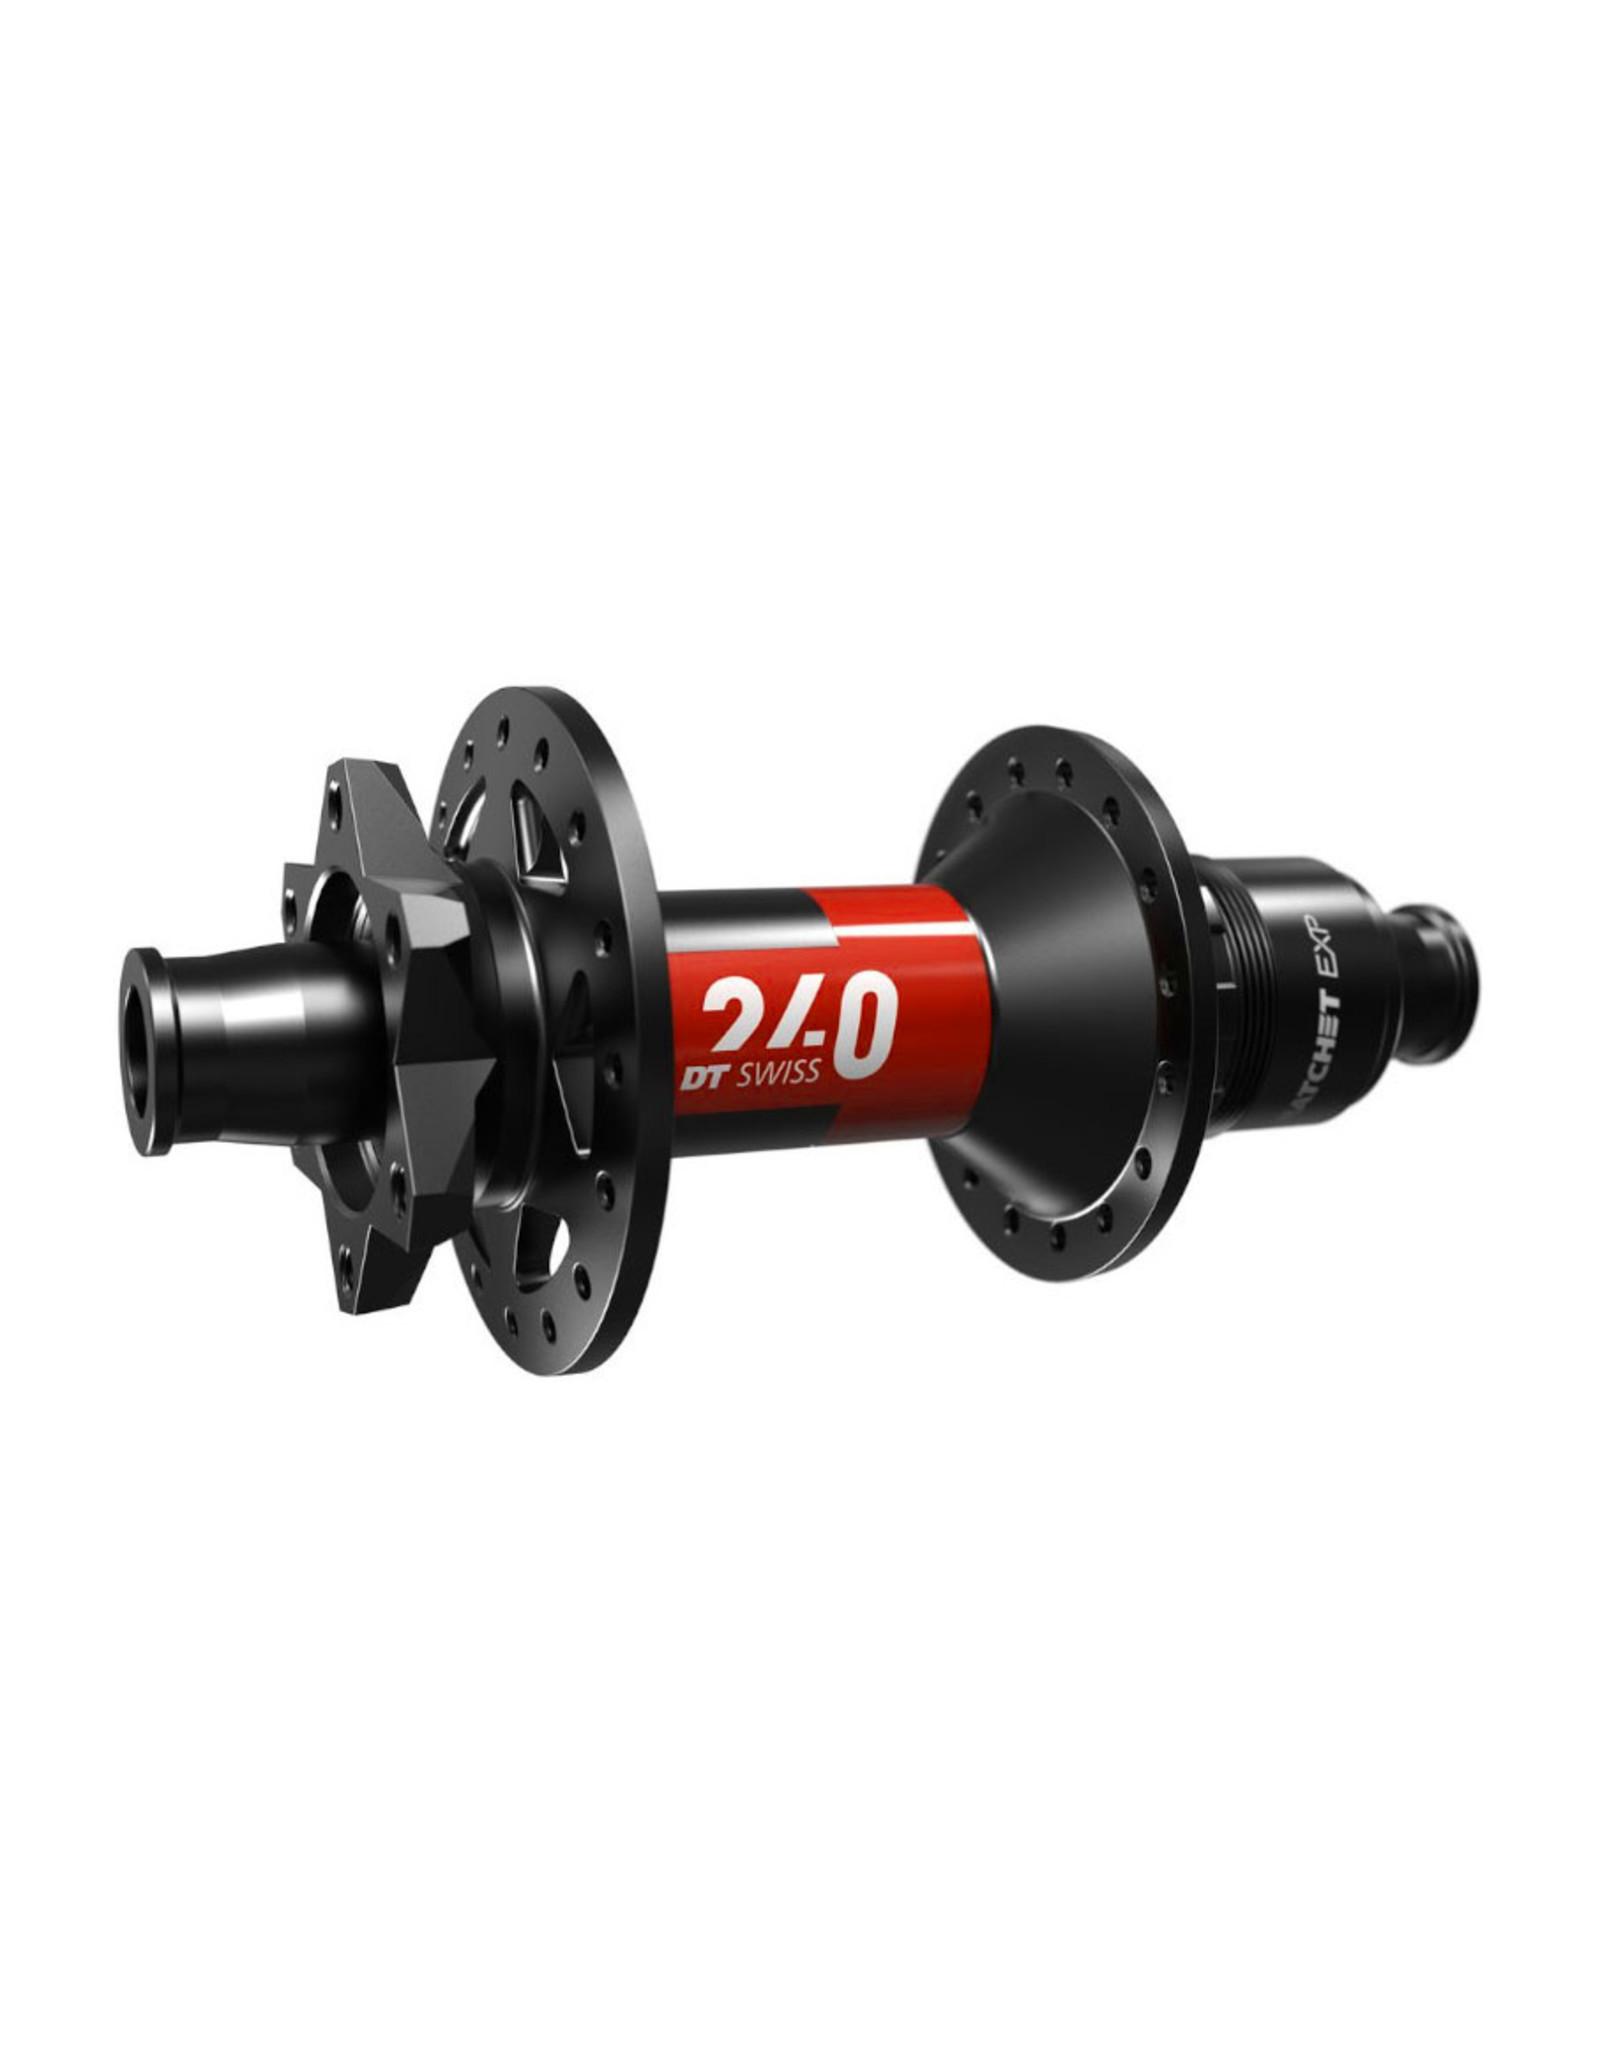 DT Swiss DT Swiss 240 EXP Super Boost 6-Bolt Rear Hub